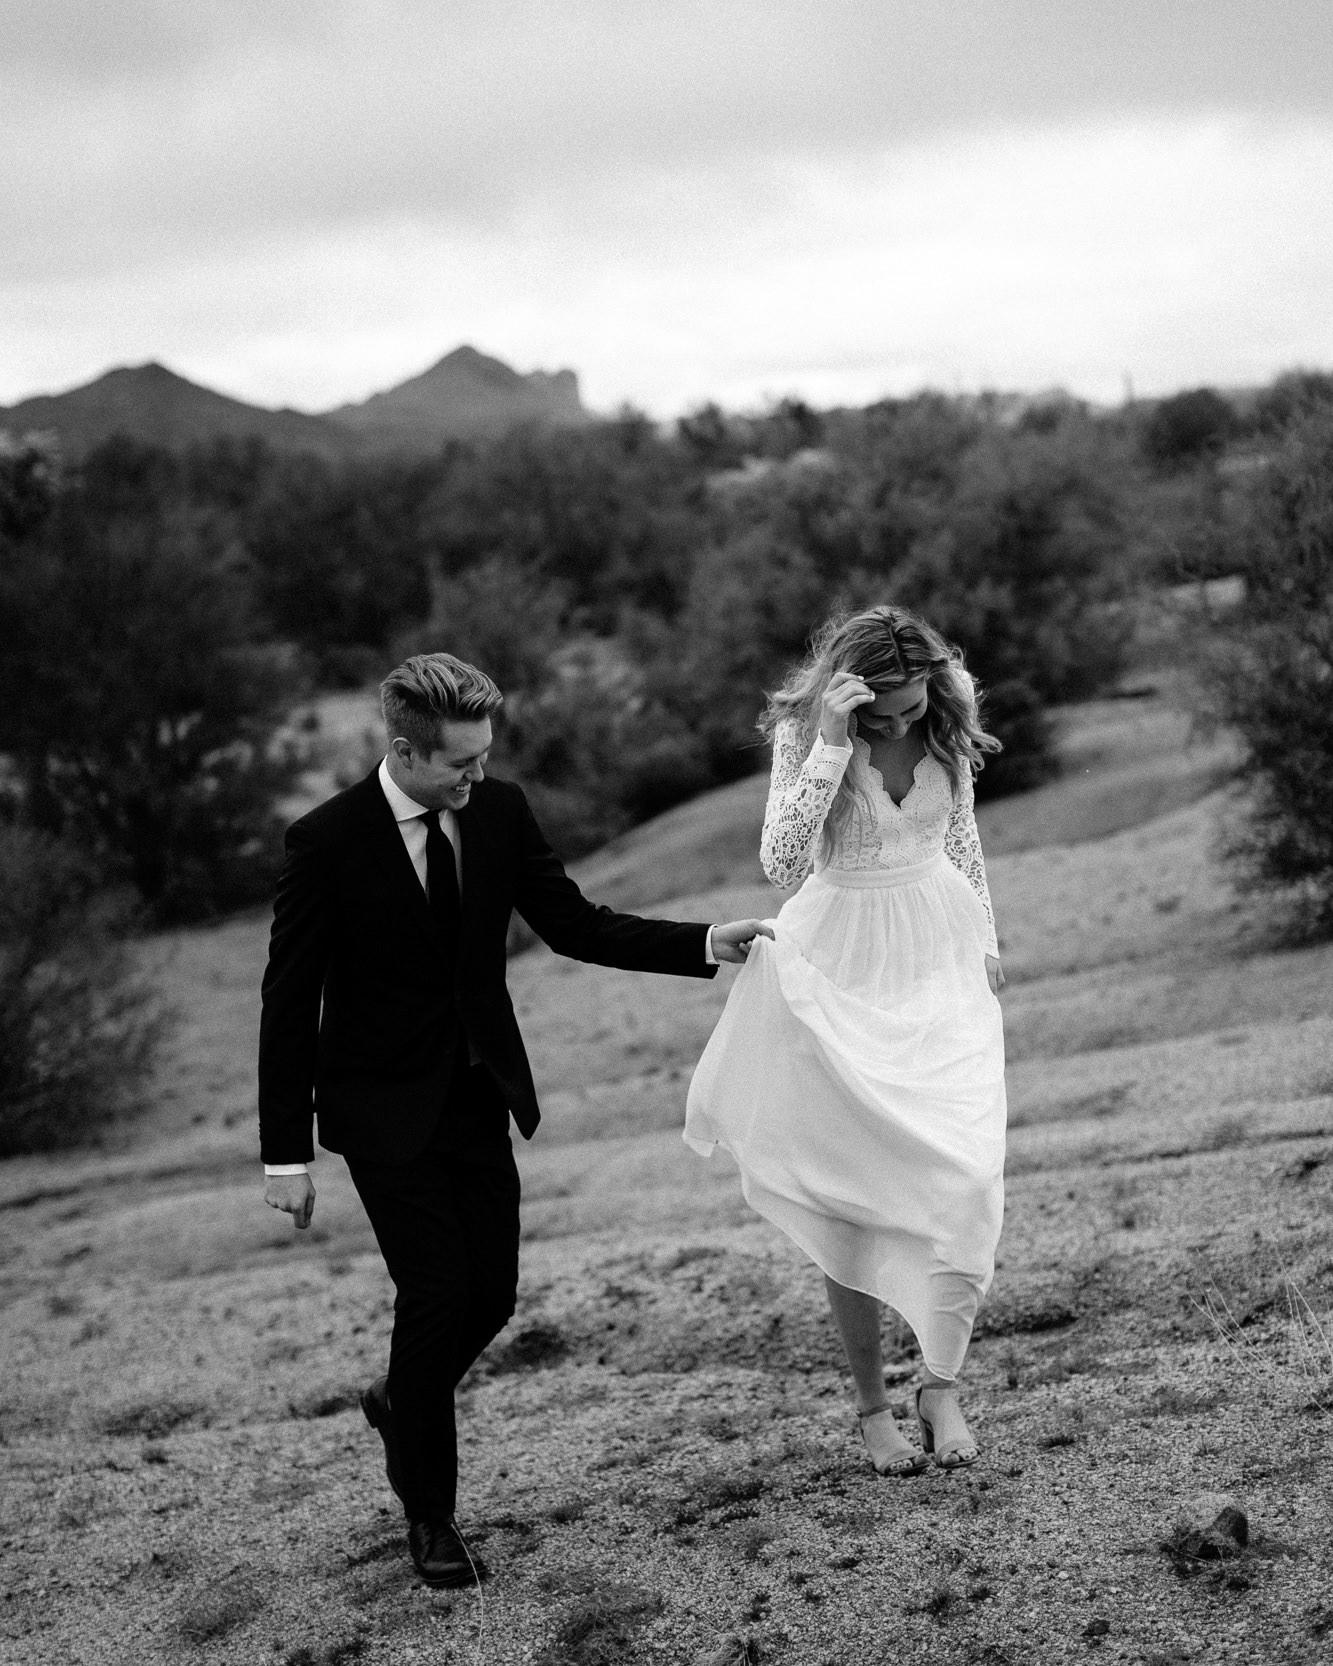 phoenix-mesa-elopement-wedding-photographer-lost-dutchman-state-park-superstitious-mountains-10.jpg